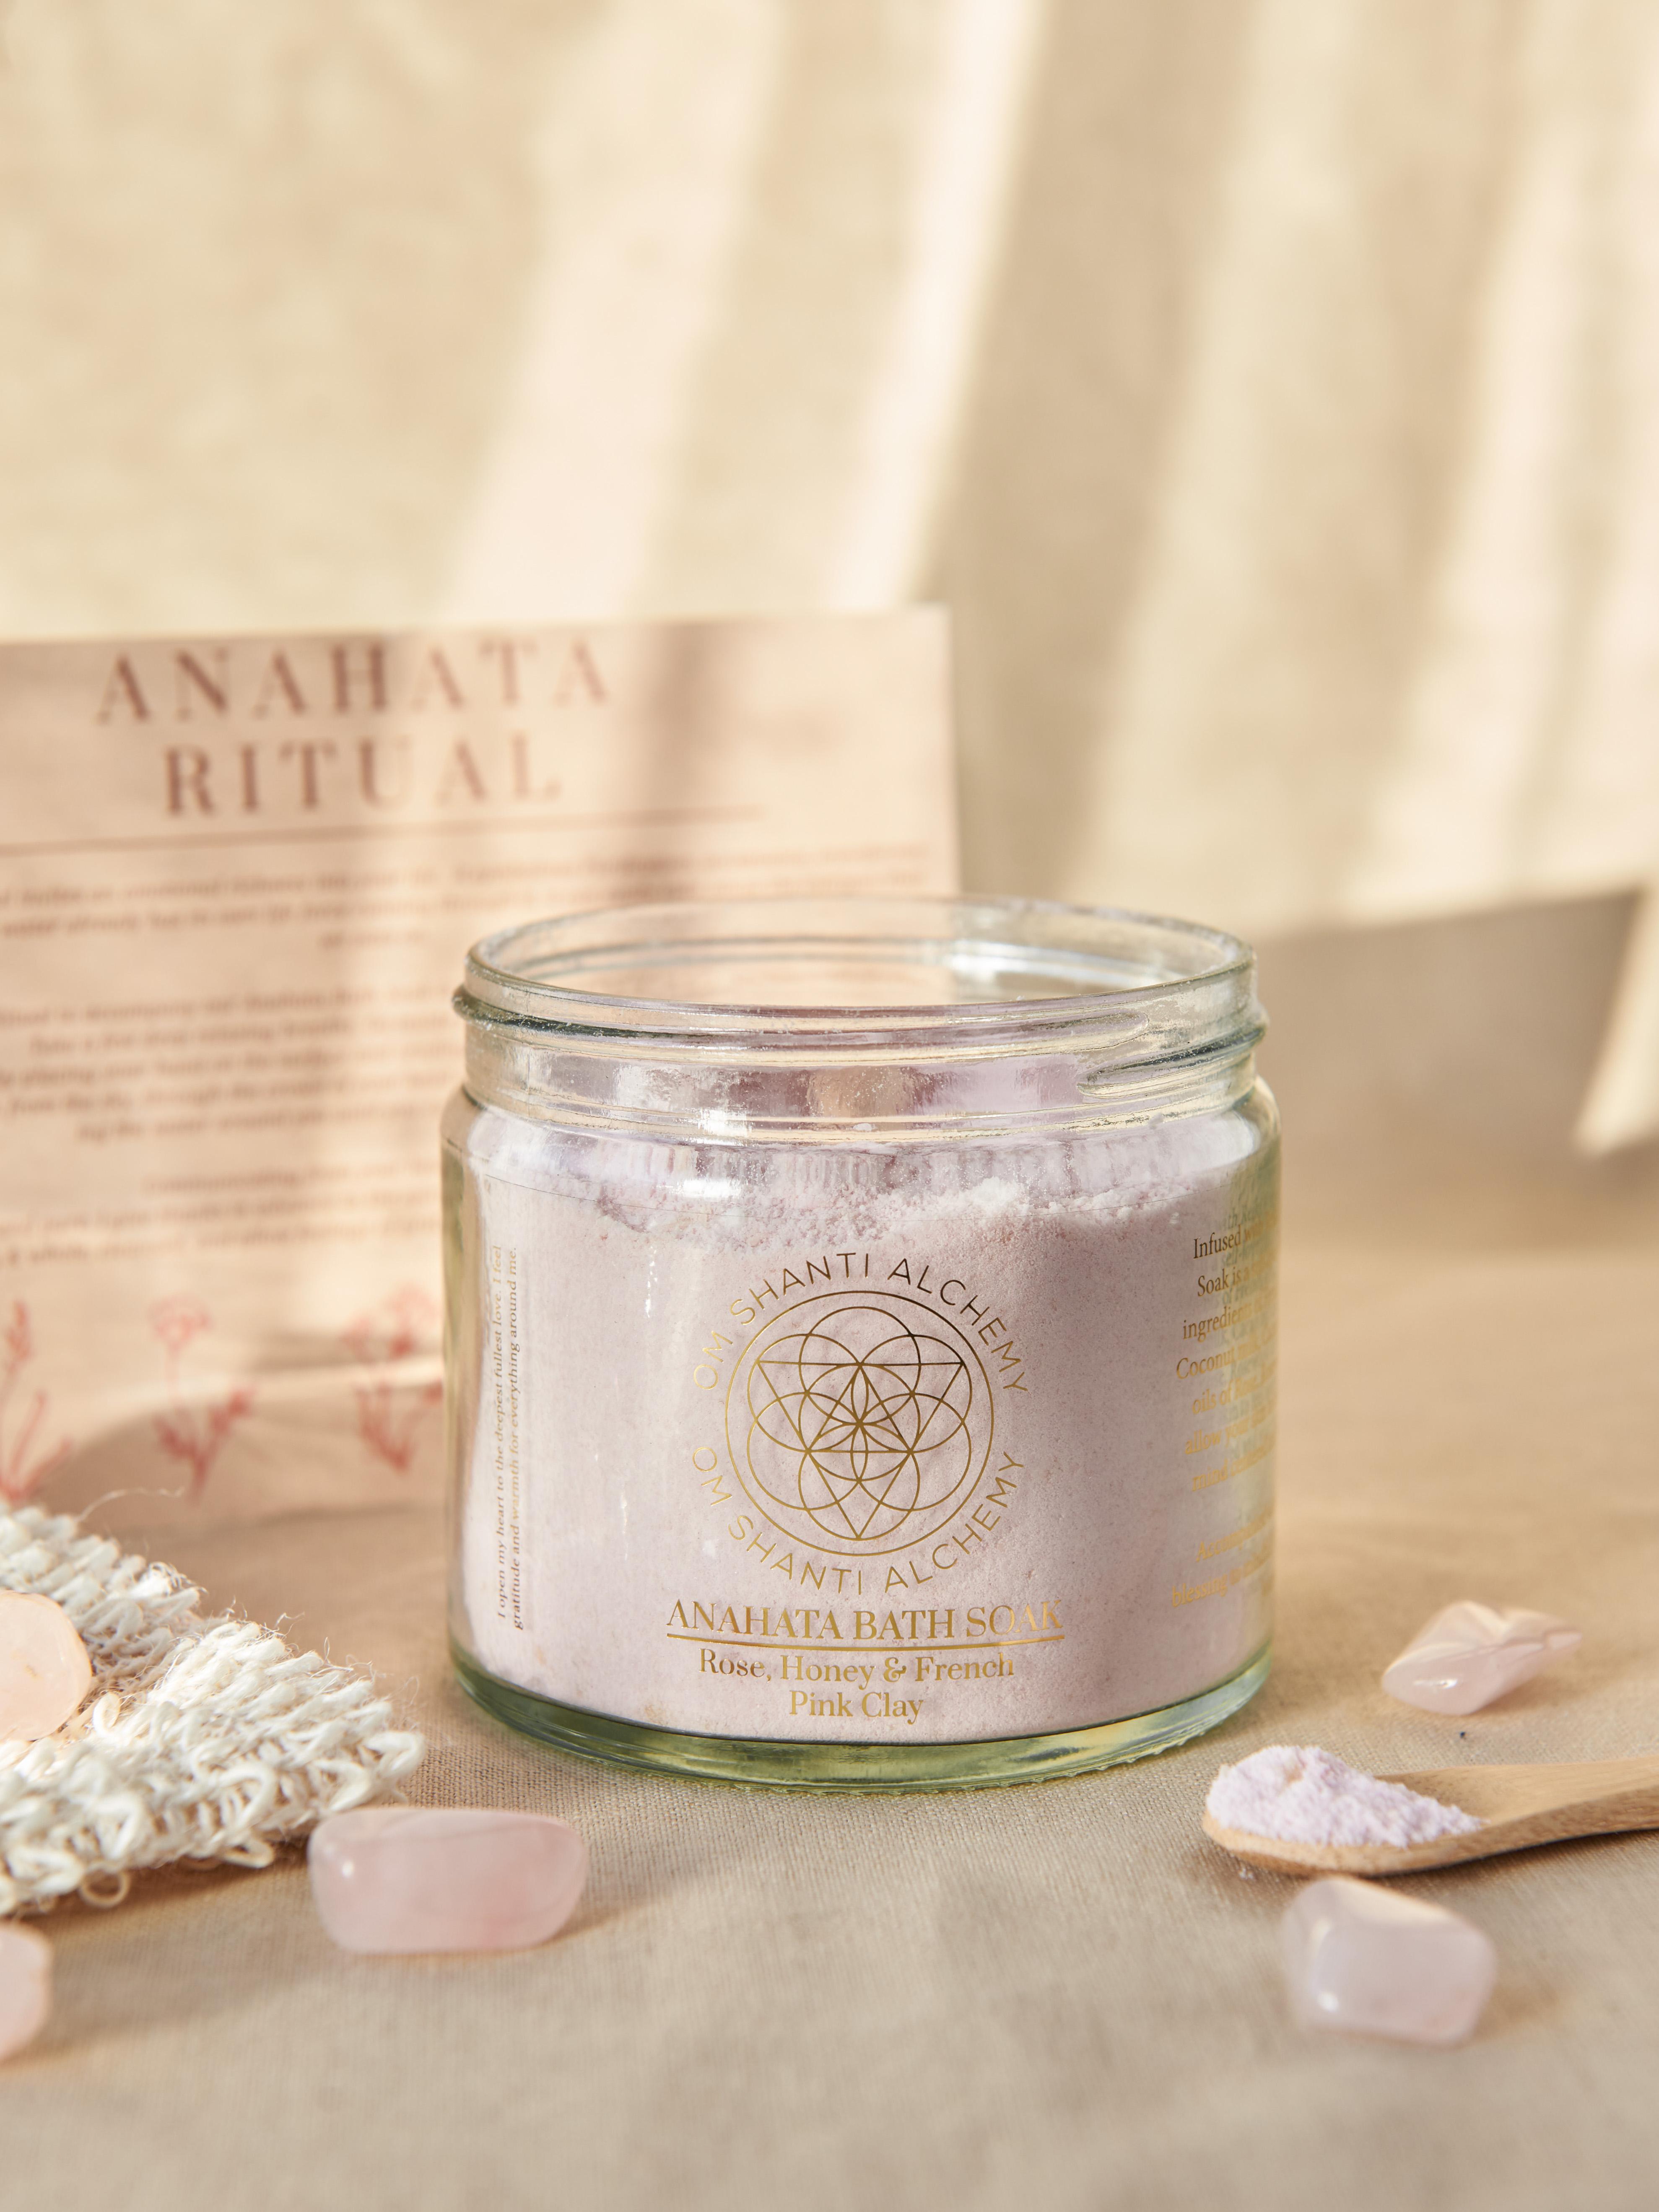 Anahata Bath Soak